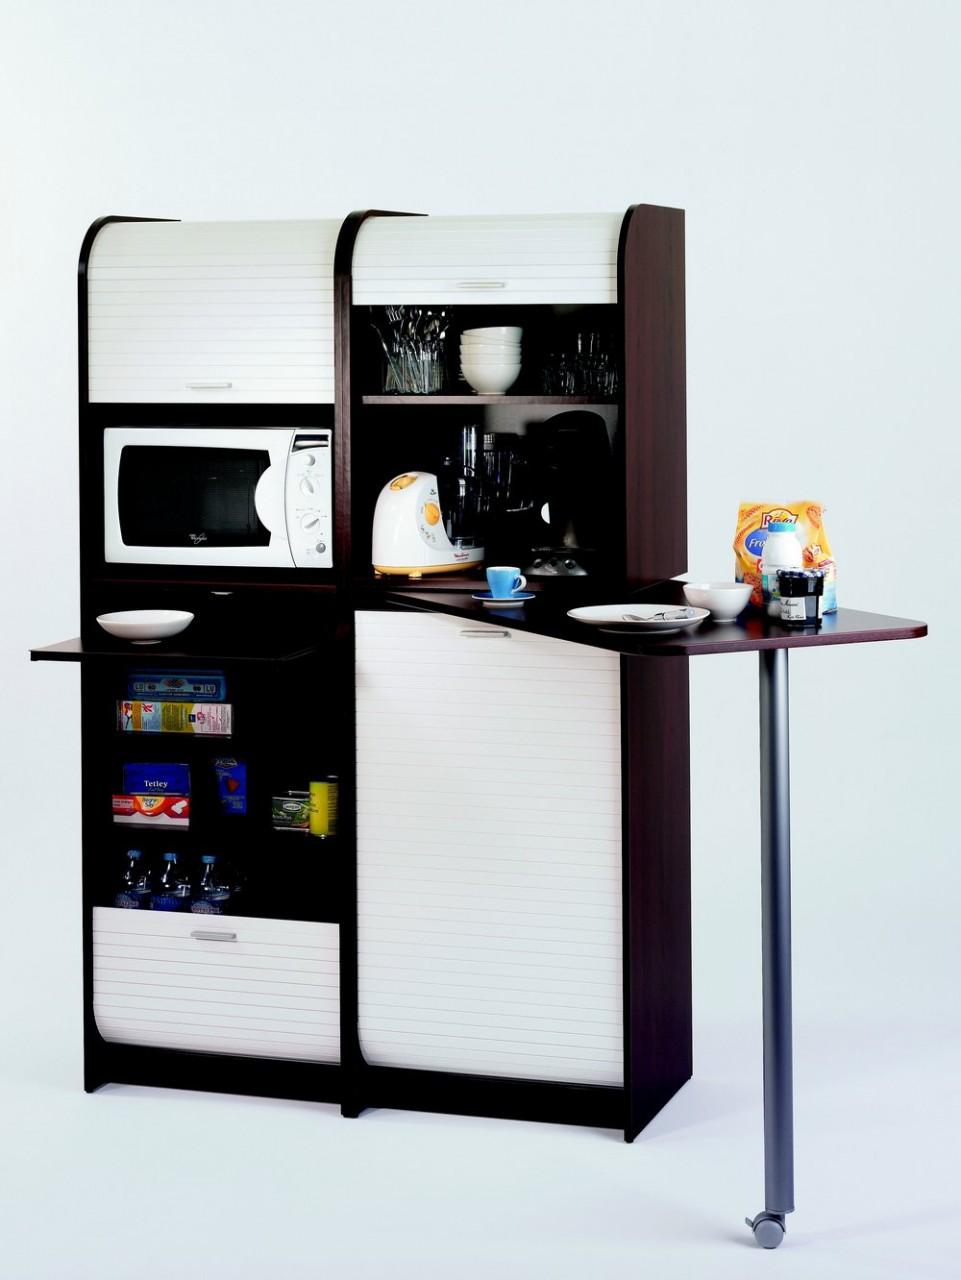 meuble self achat rangements pause caf 314 00. Black Bedroom Furniture Sets. Home Design Ideas